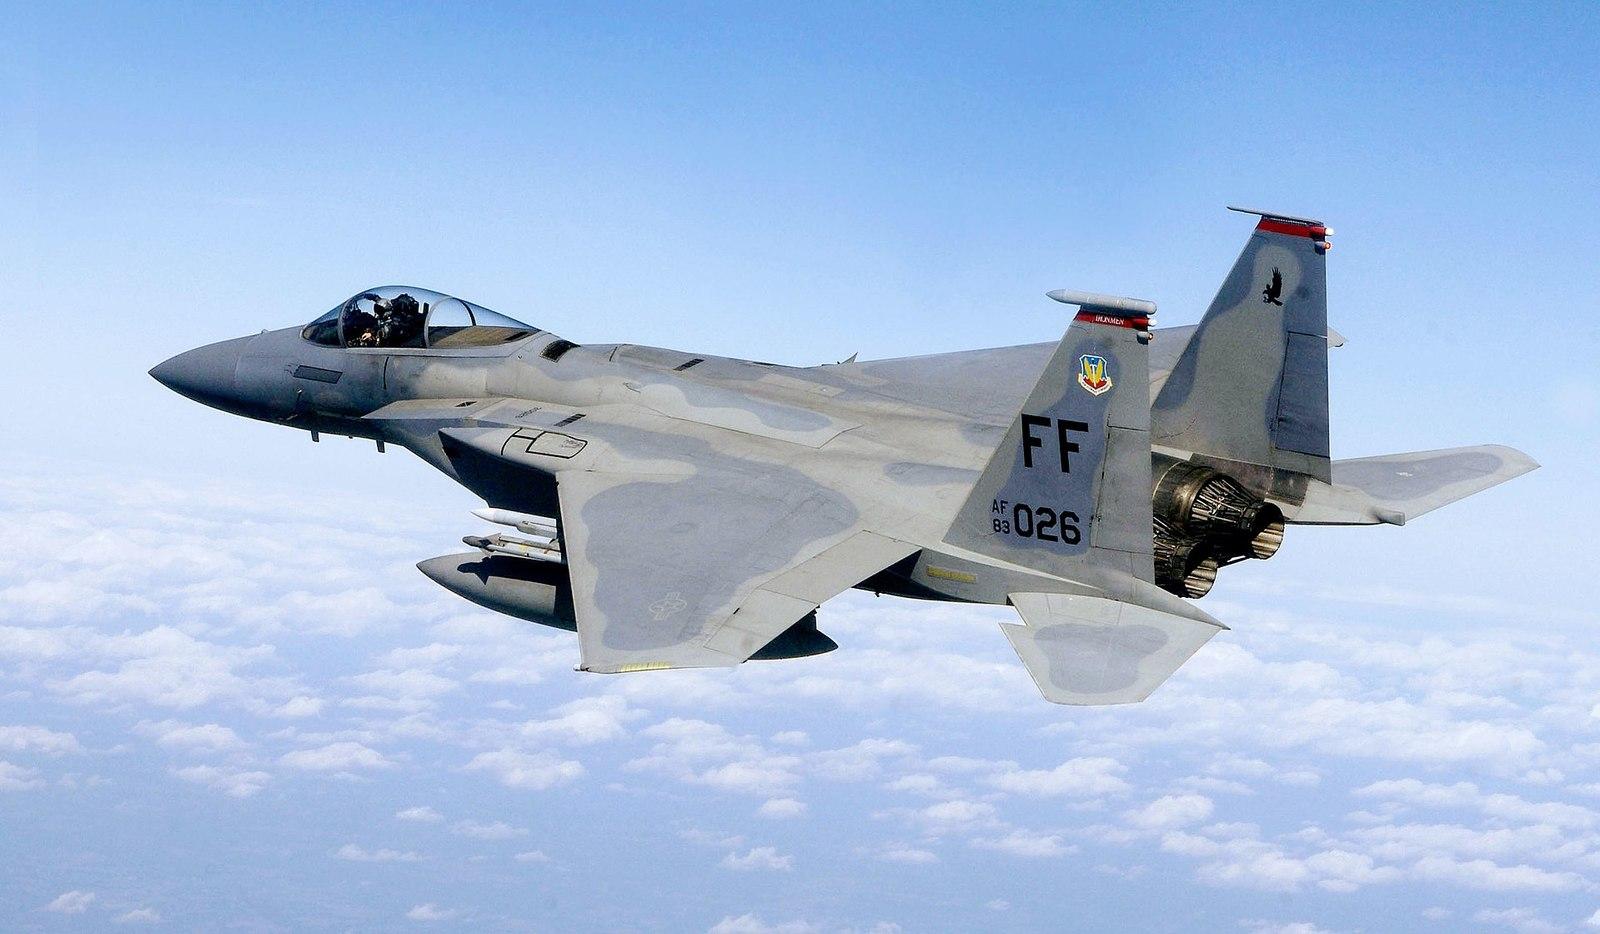 1920px-F-15%2C_71st_Fighter_Squadron%2C_in_flight.jpg